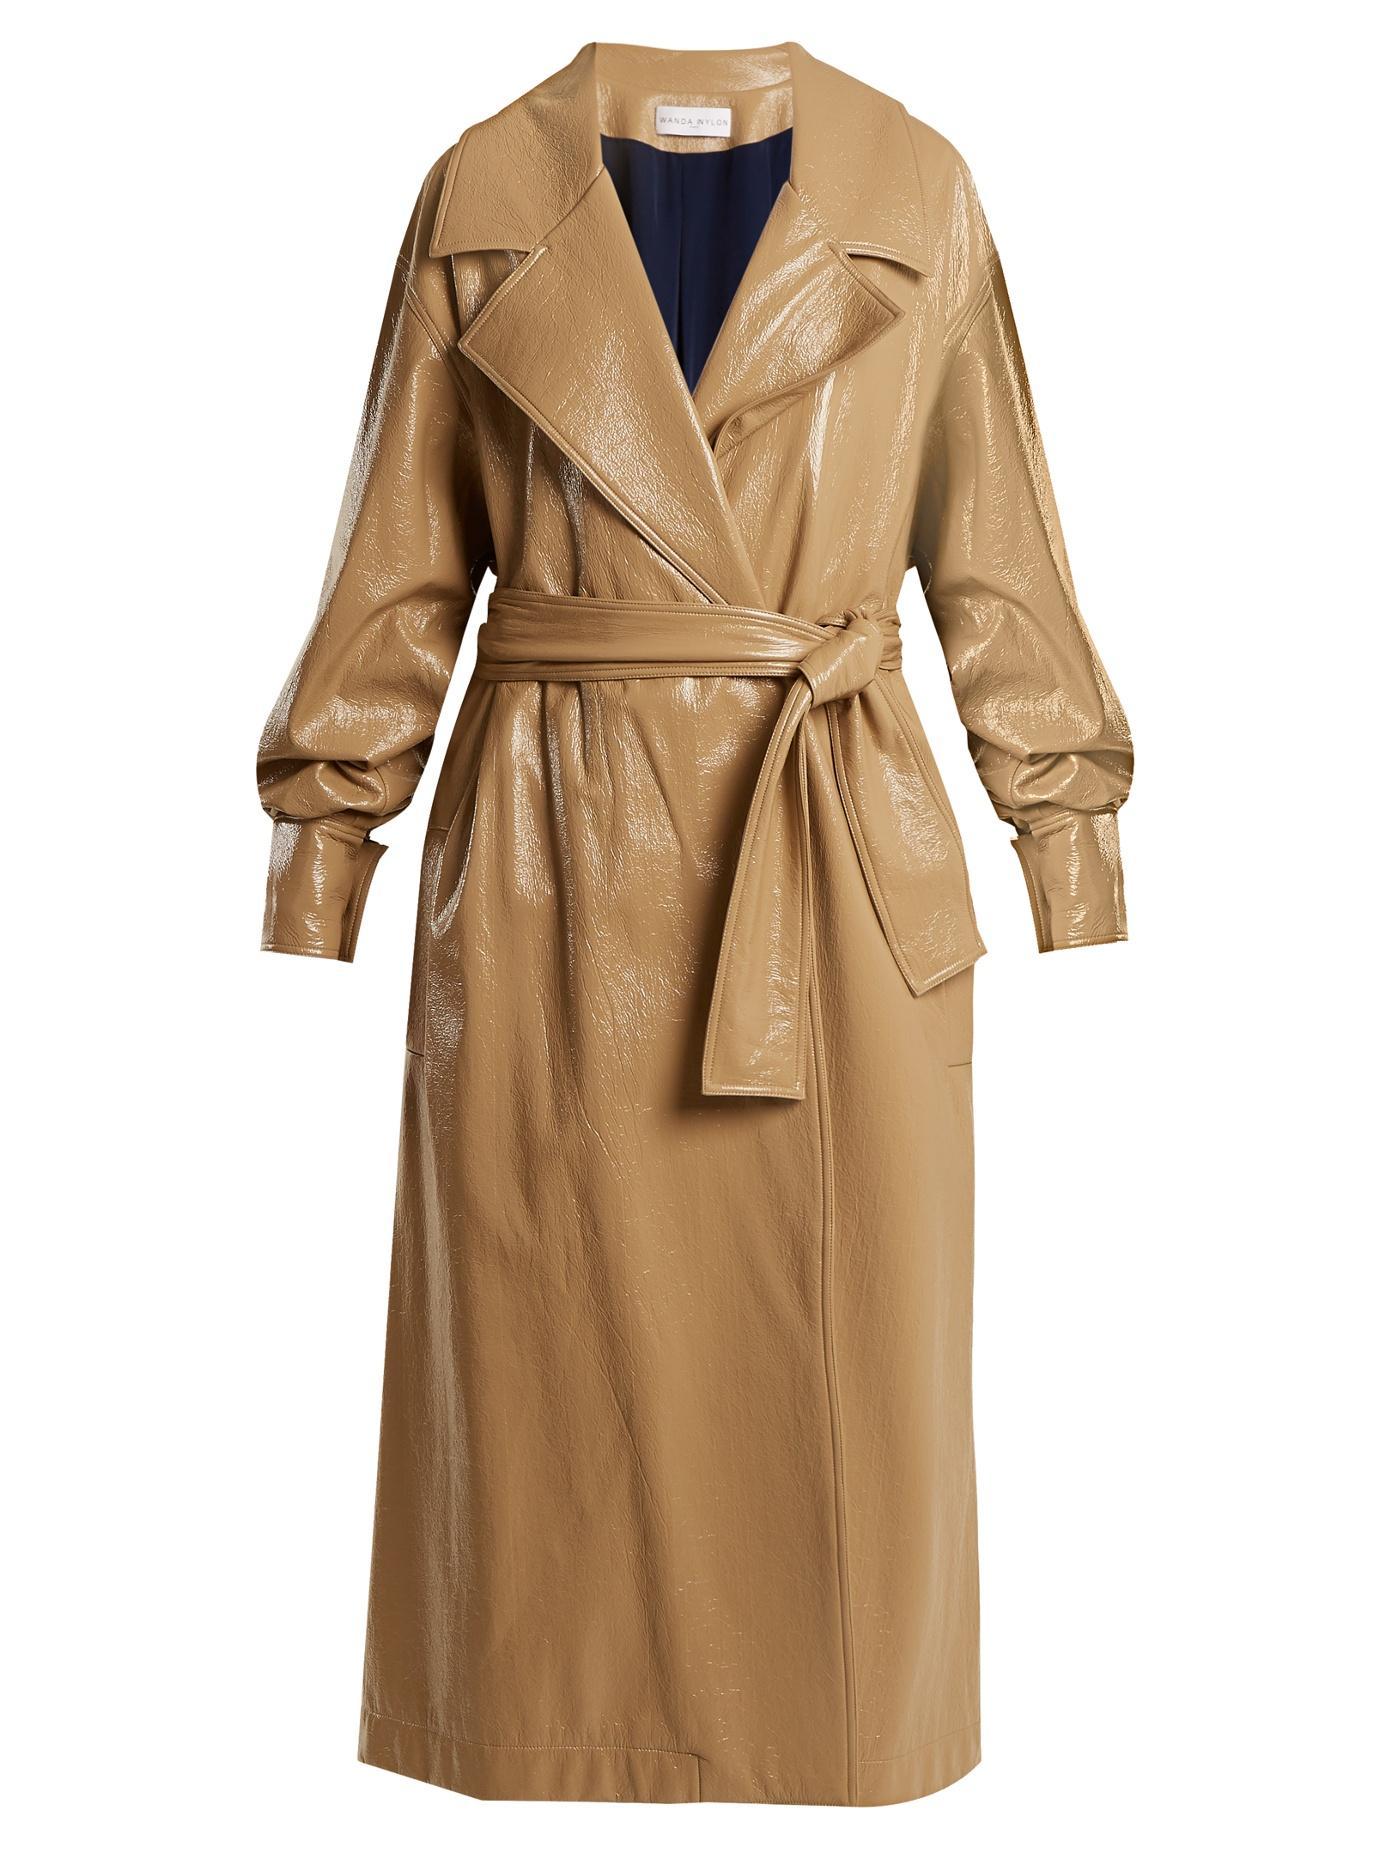 Wanda Nylon Oversized Coated Trench Coat In Caramel-Beige